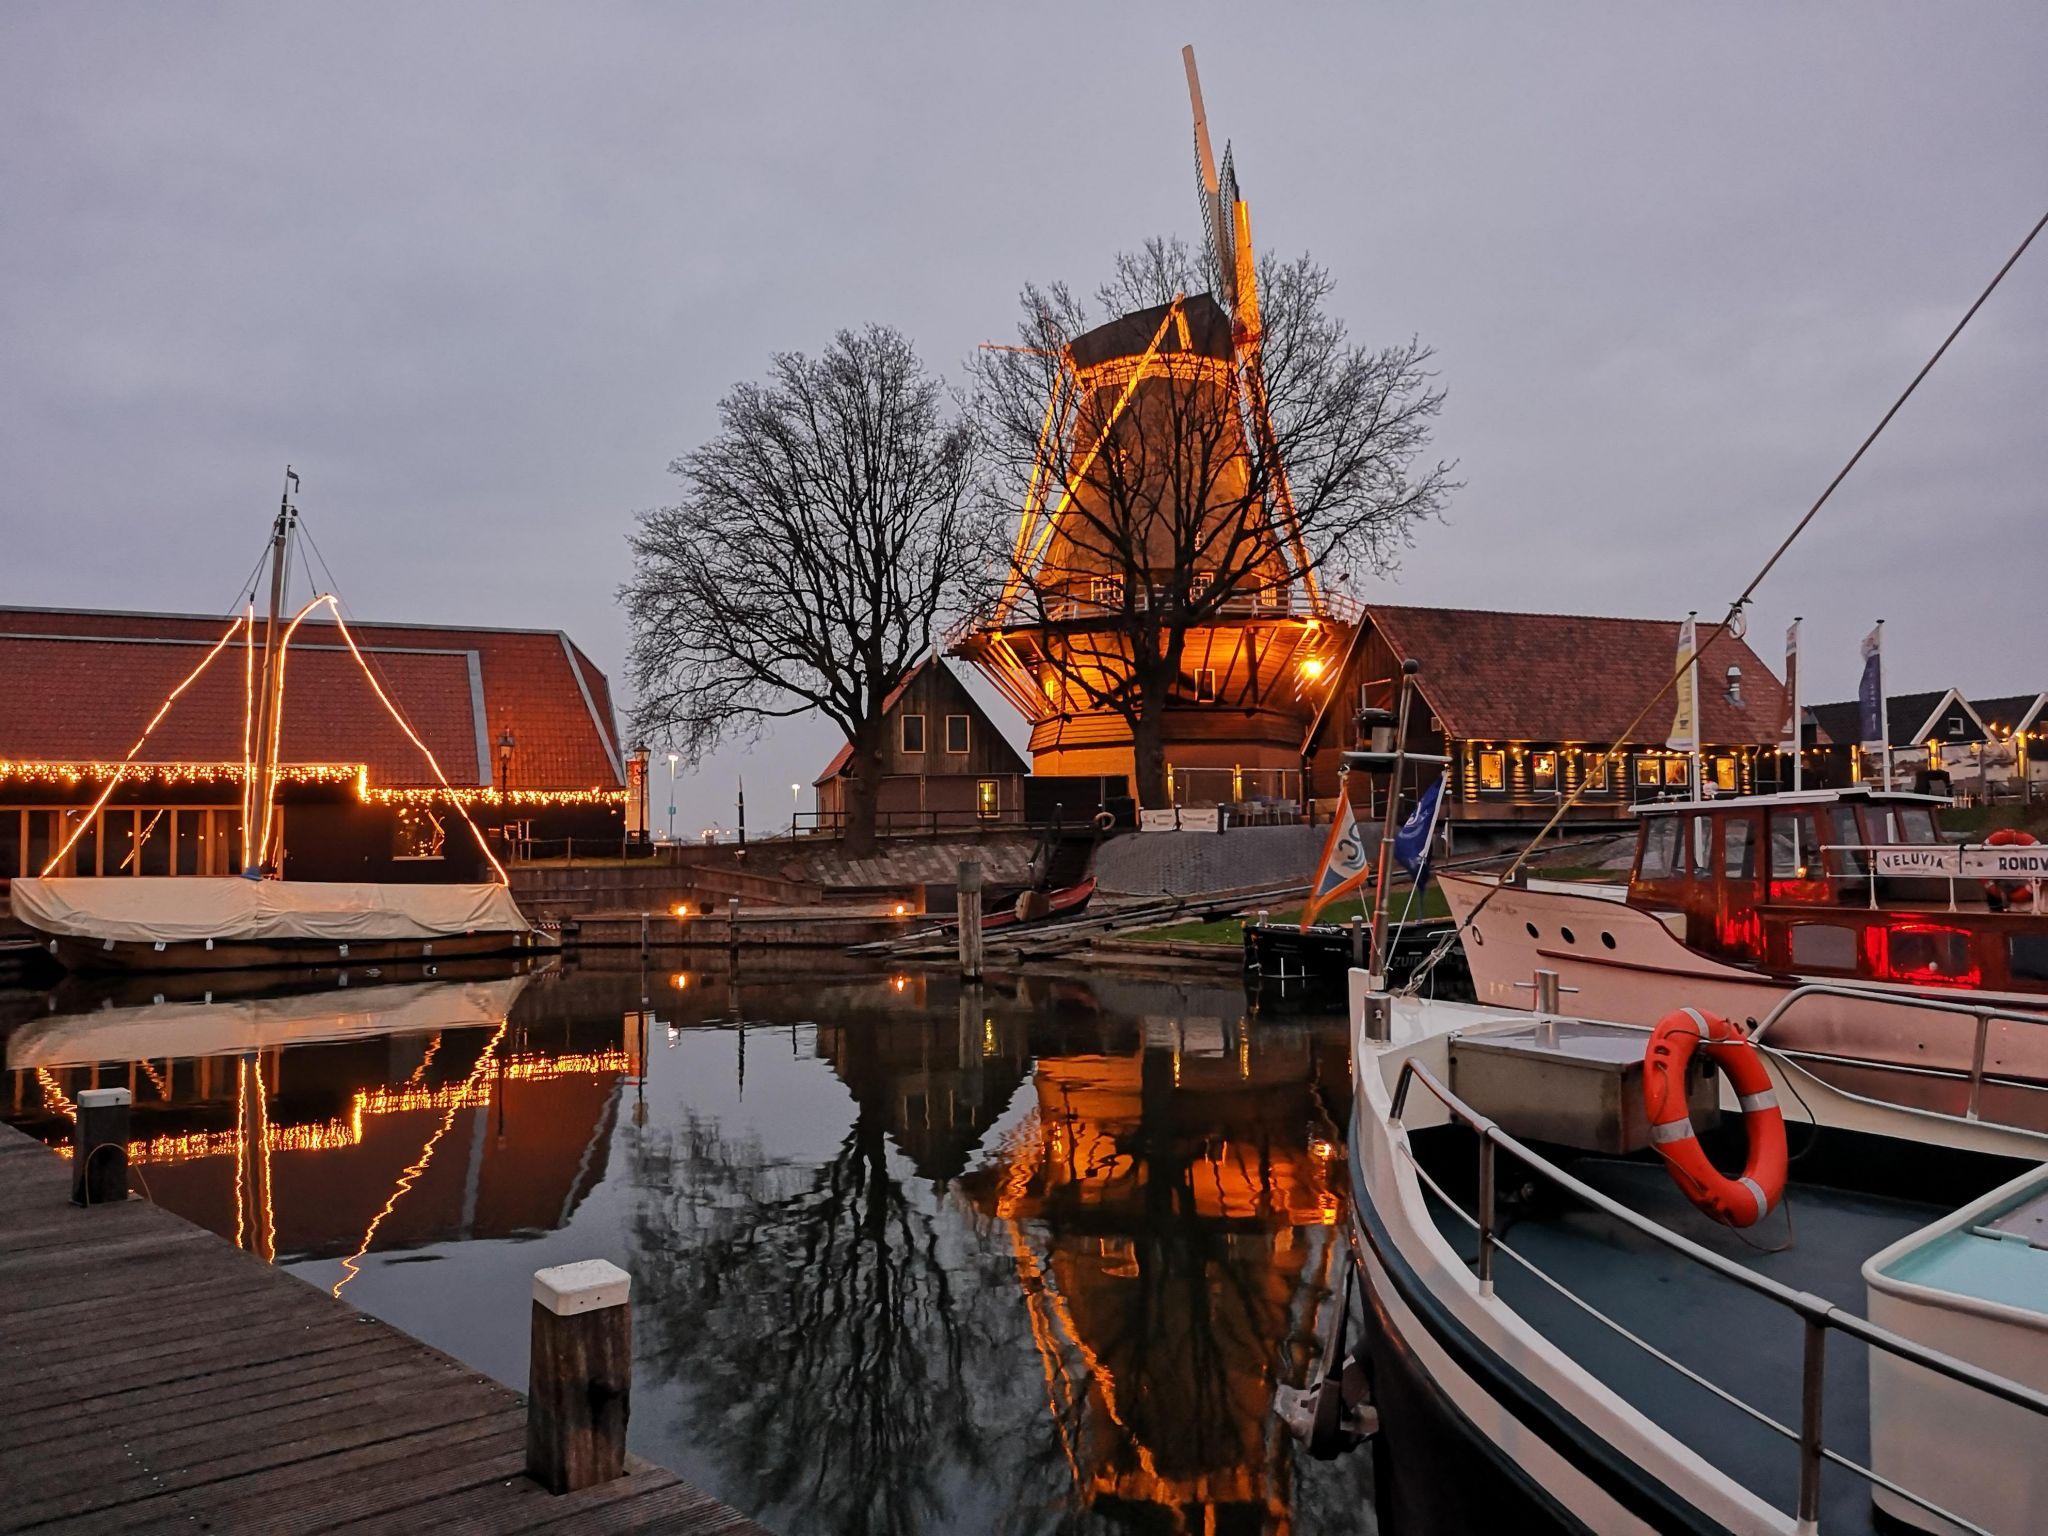 Windmill de hoop, Netherlands